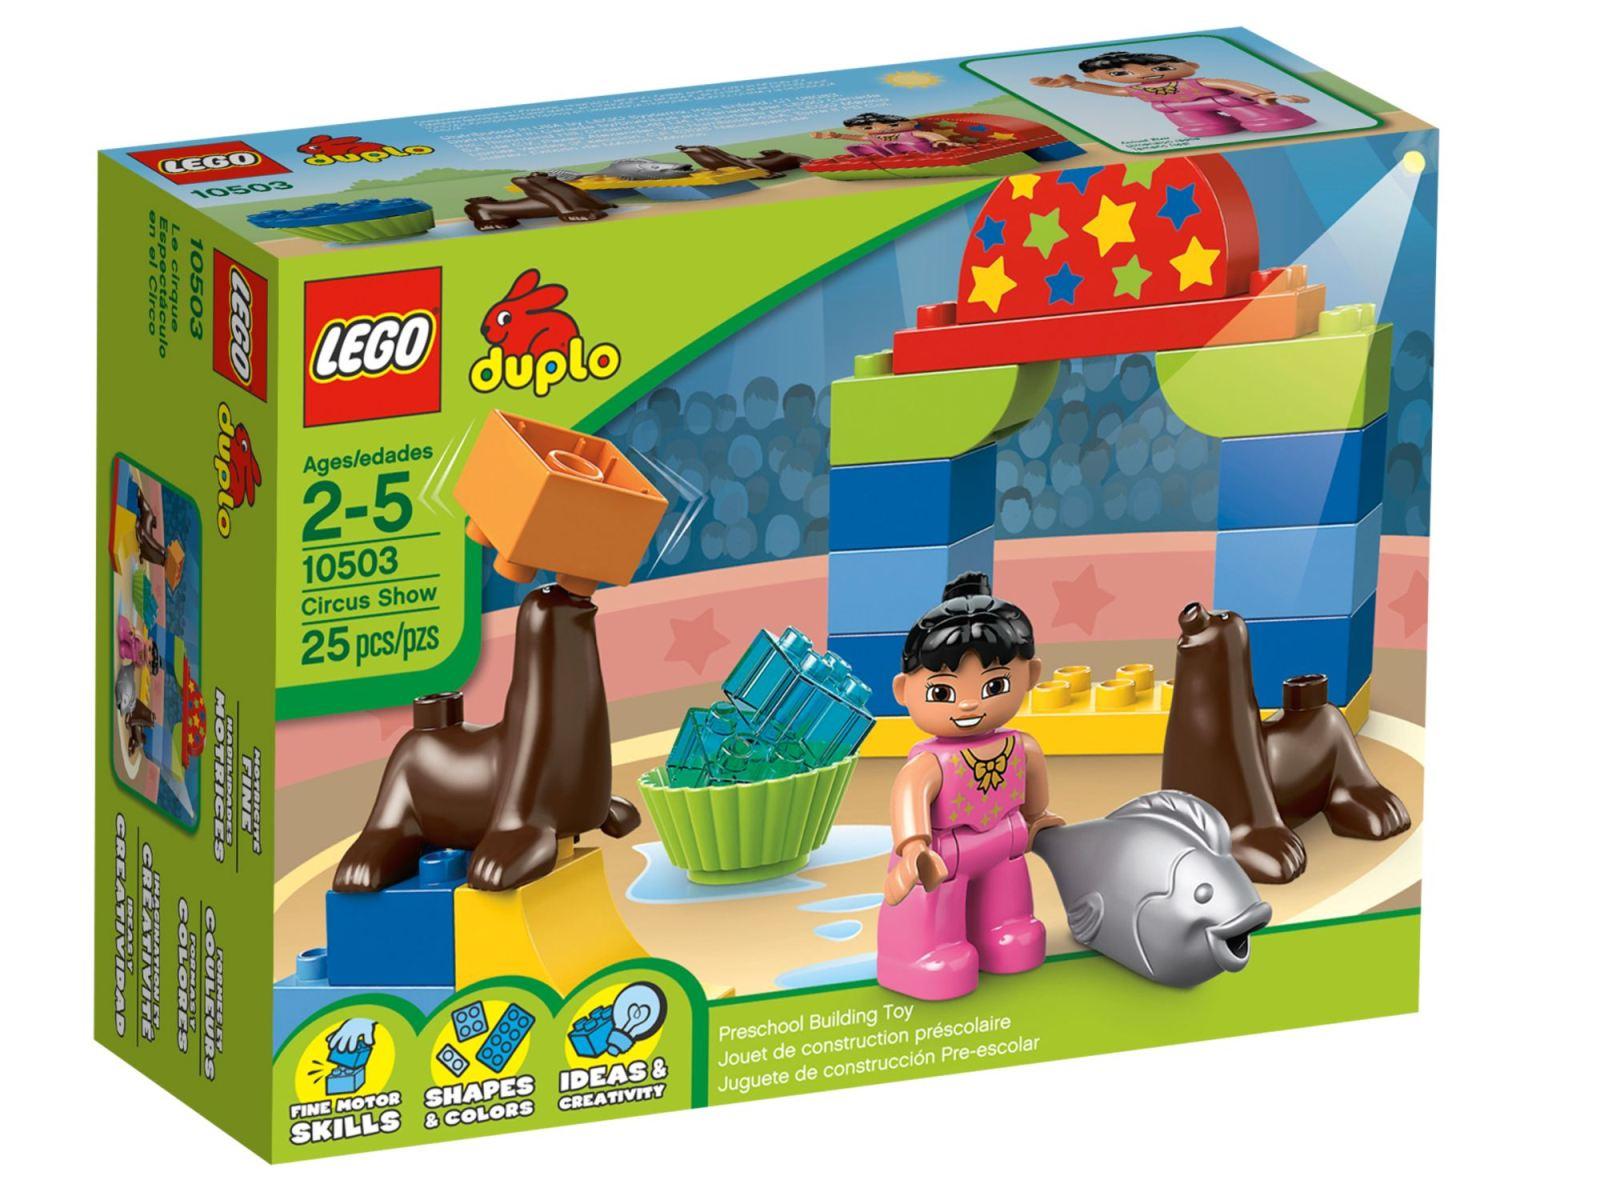 Đồ chơi LEGO 10503